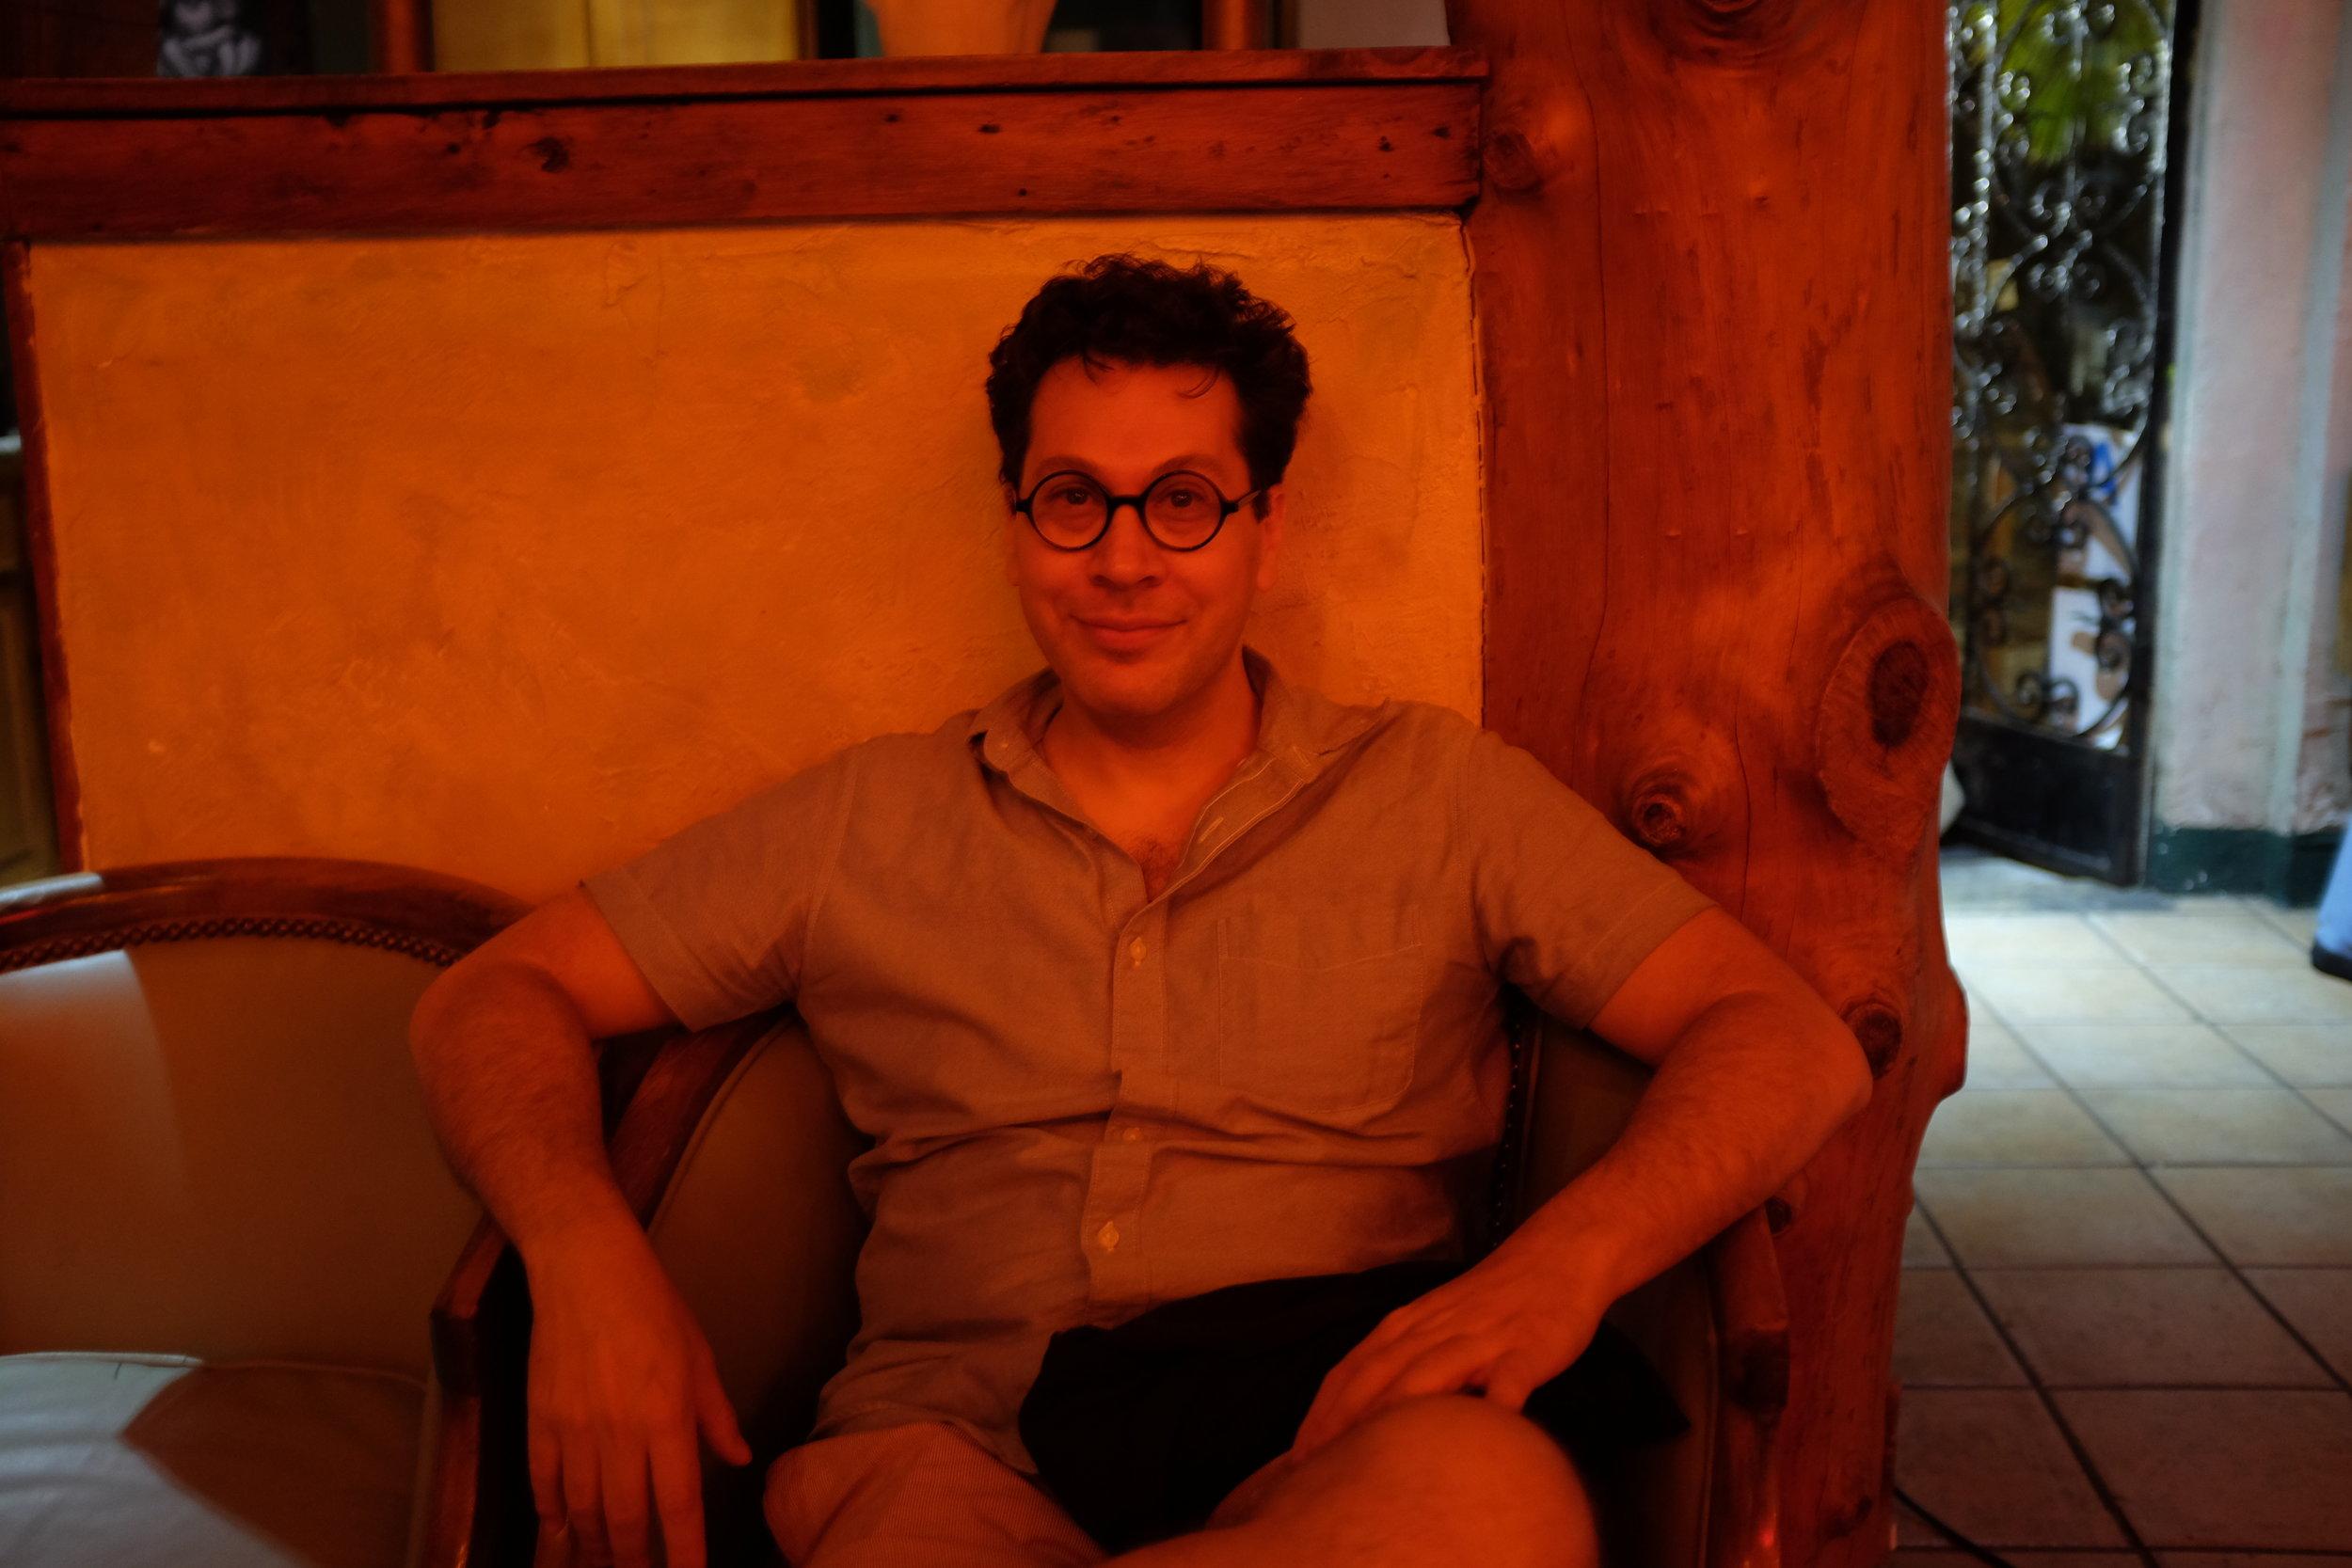 Dan Levenson, my LA art star friend in red